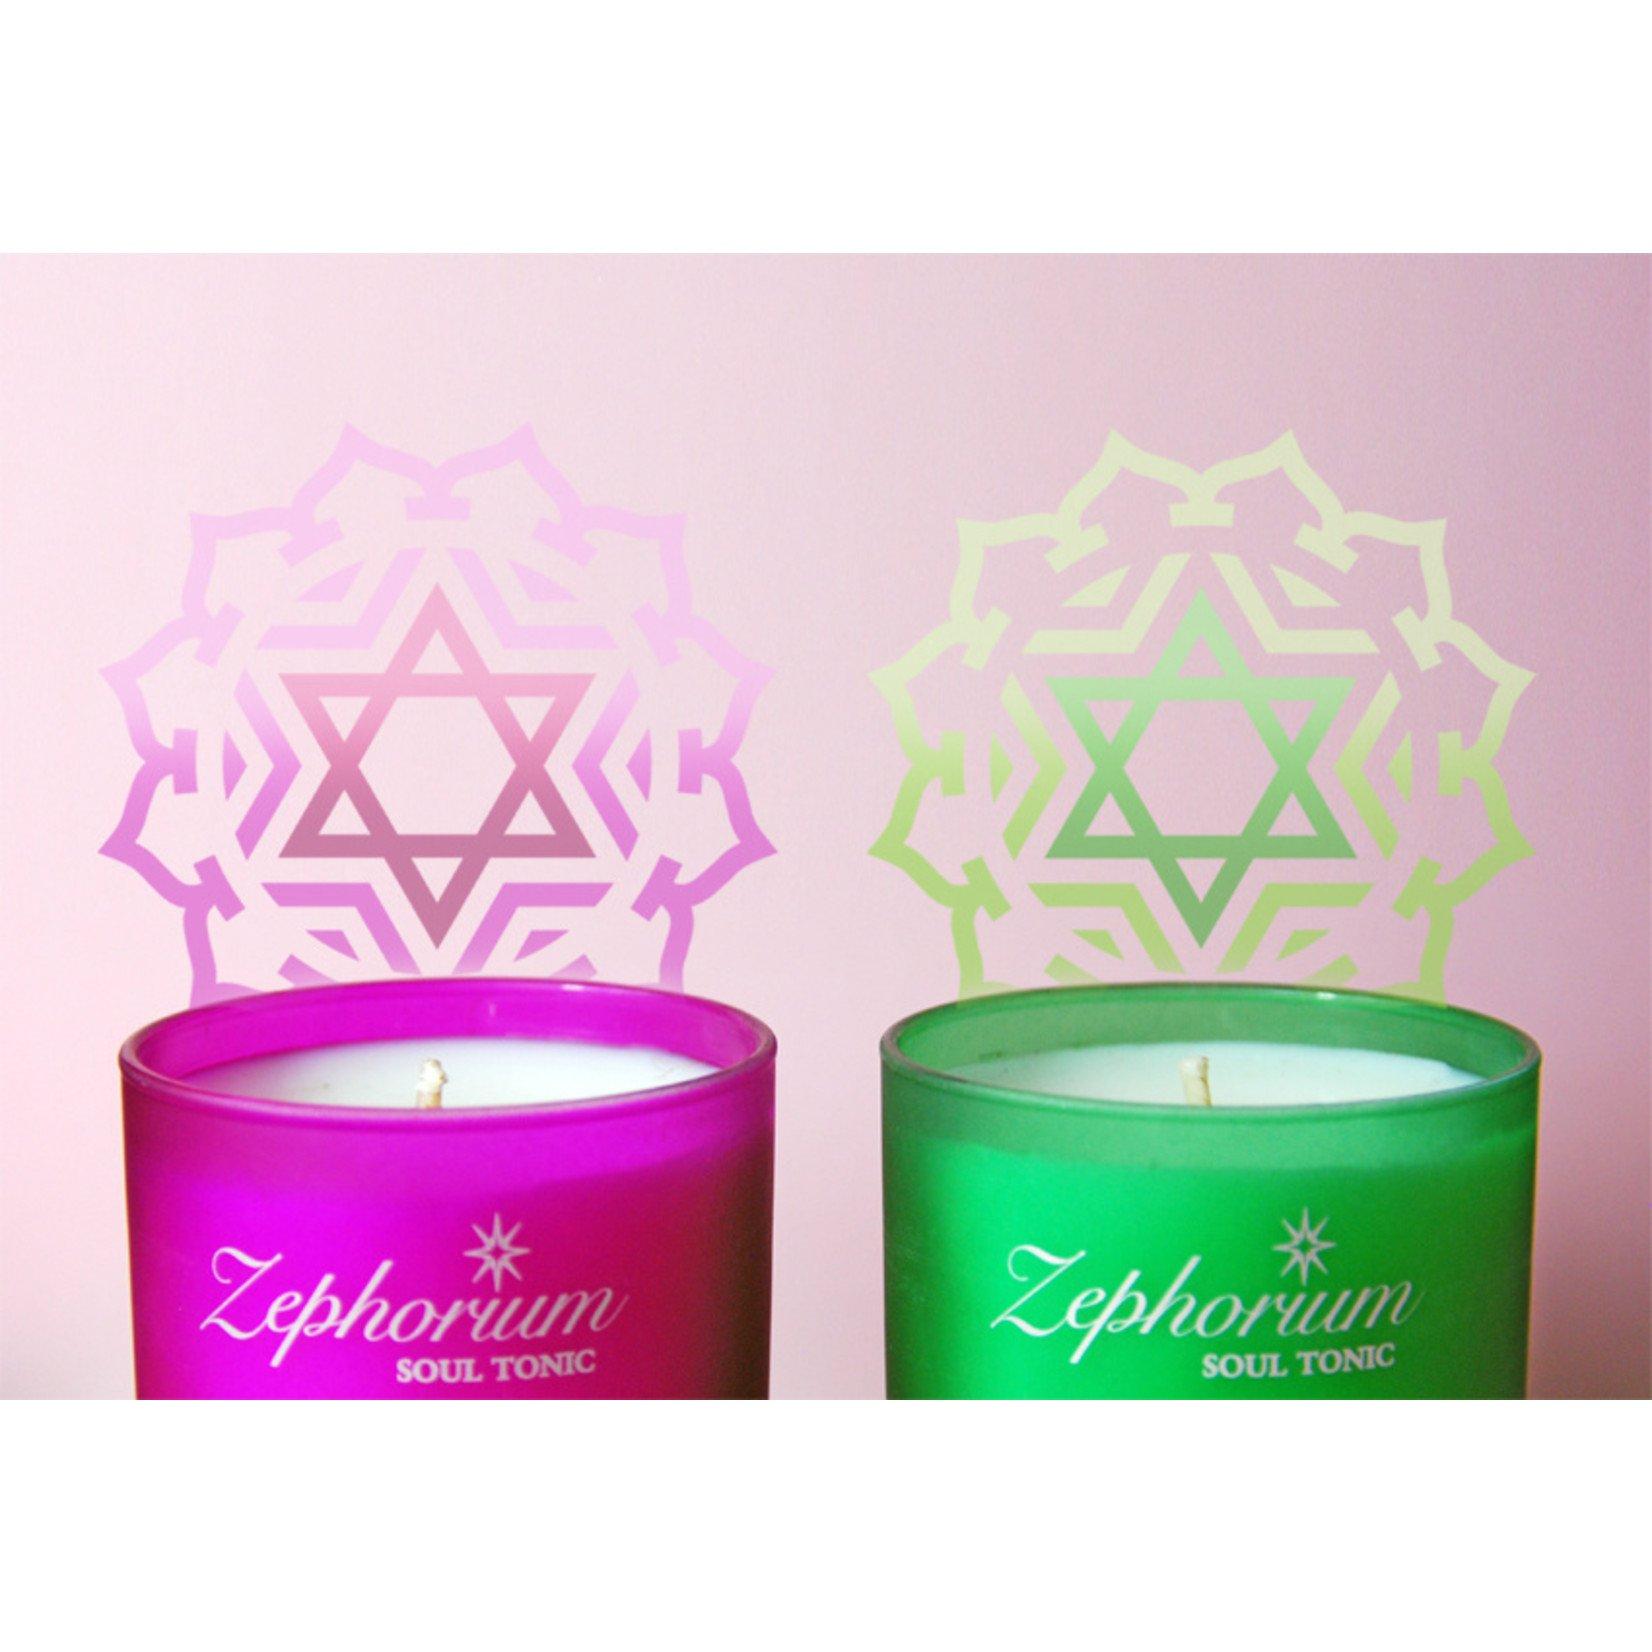 Zephorium Emerald aromatherapiekaars Zephorium - hartchakra